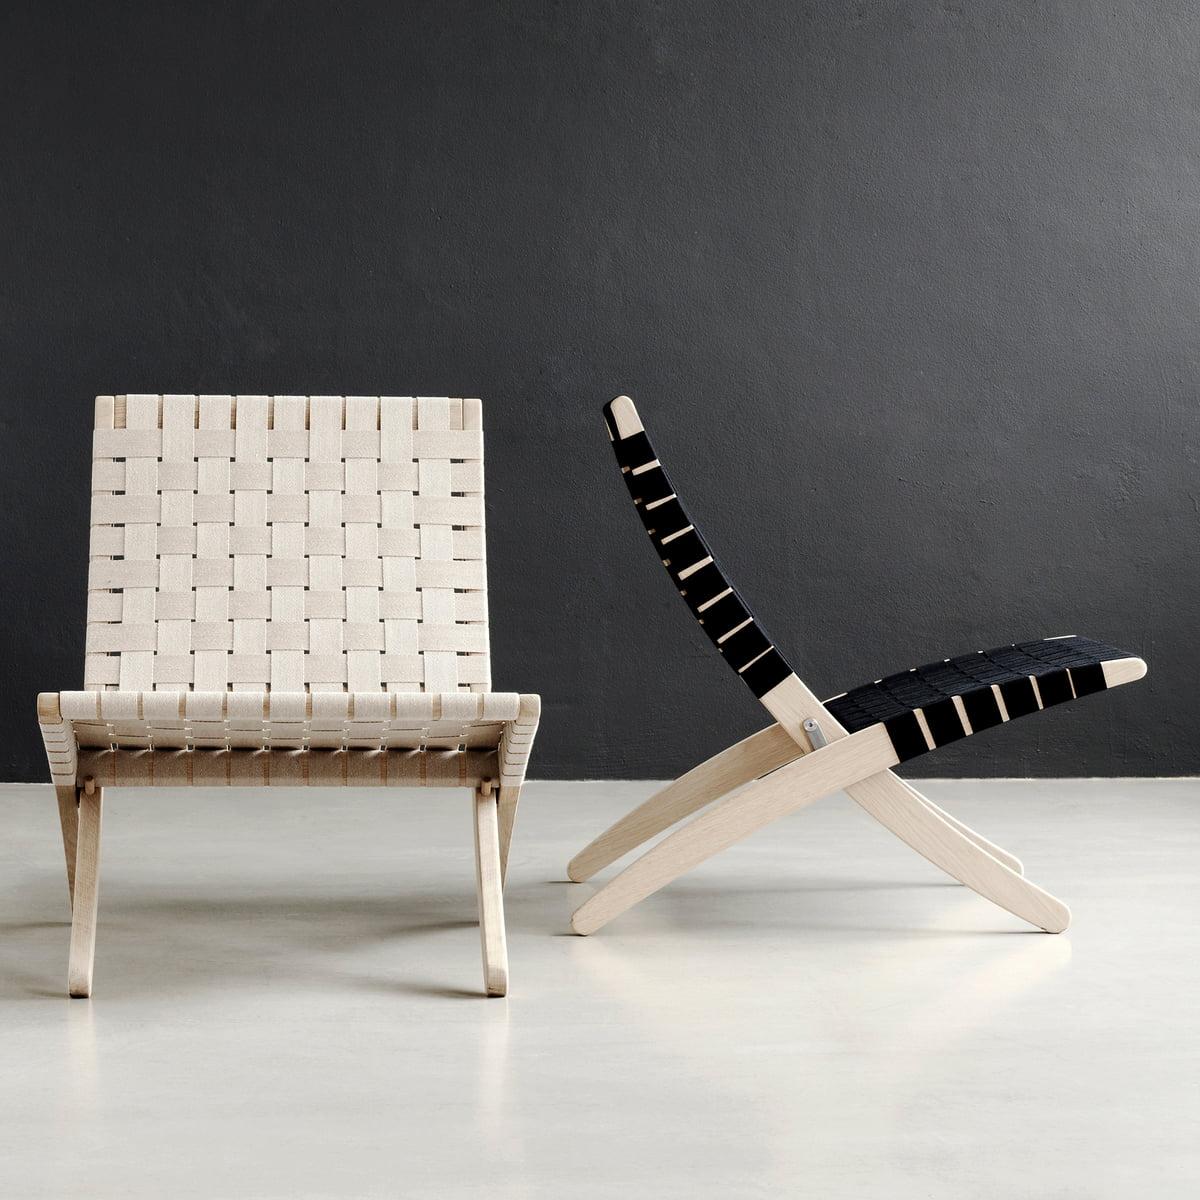 Mg501 Cuba Chair By Carl Hansen In The Shop